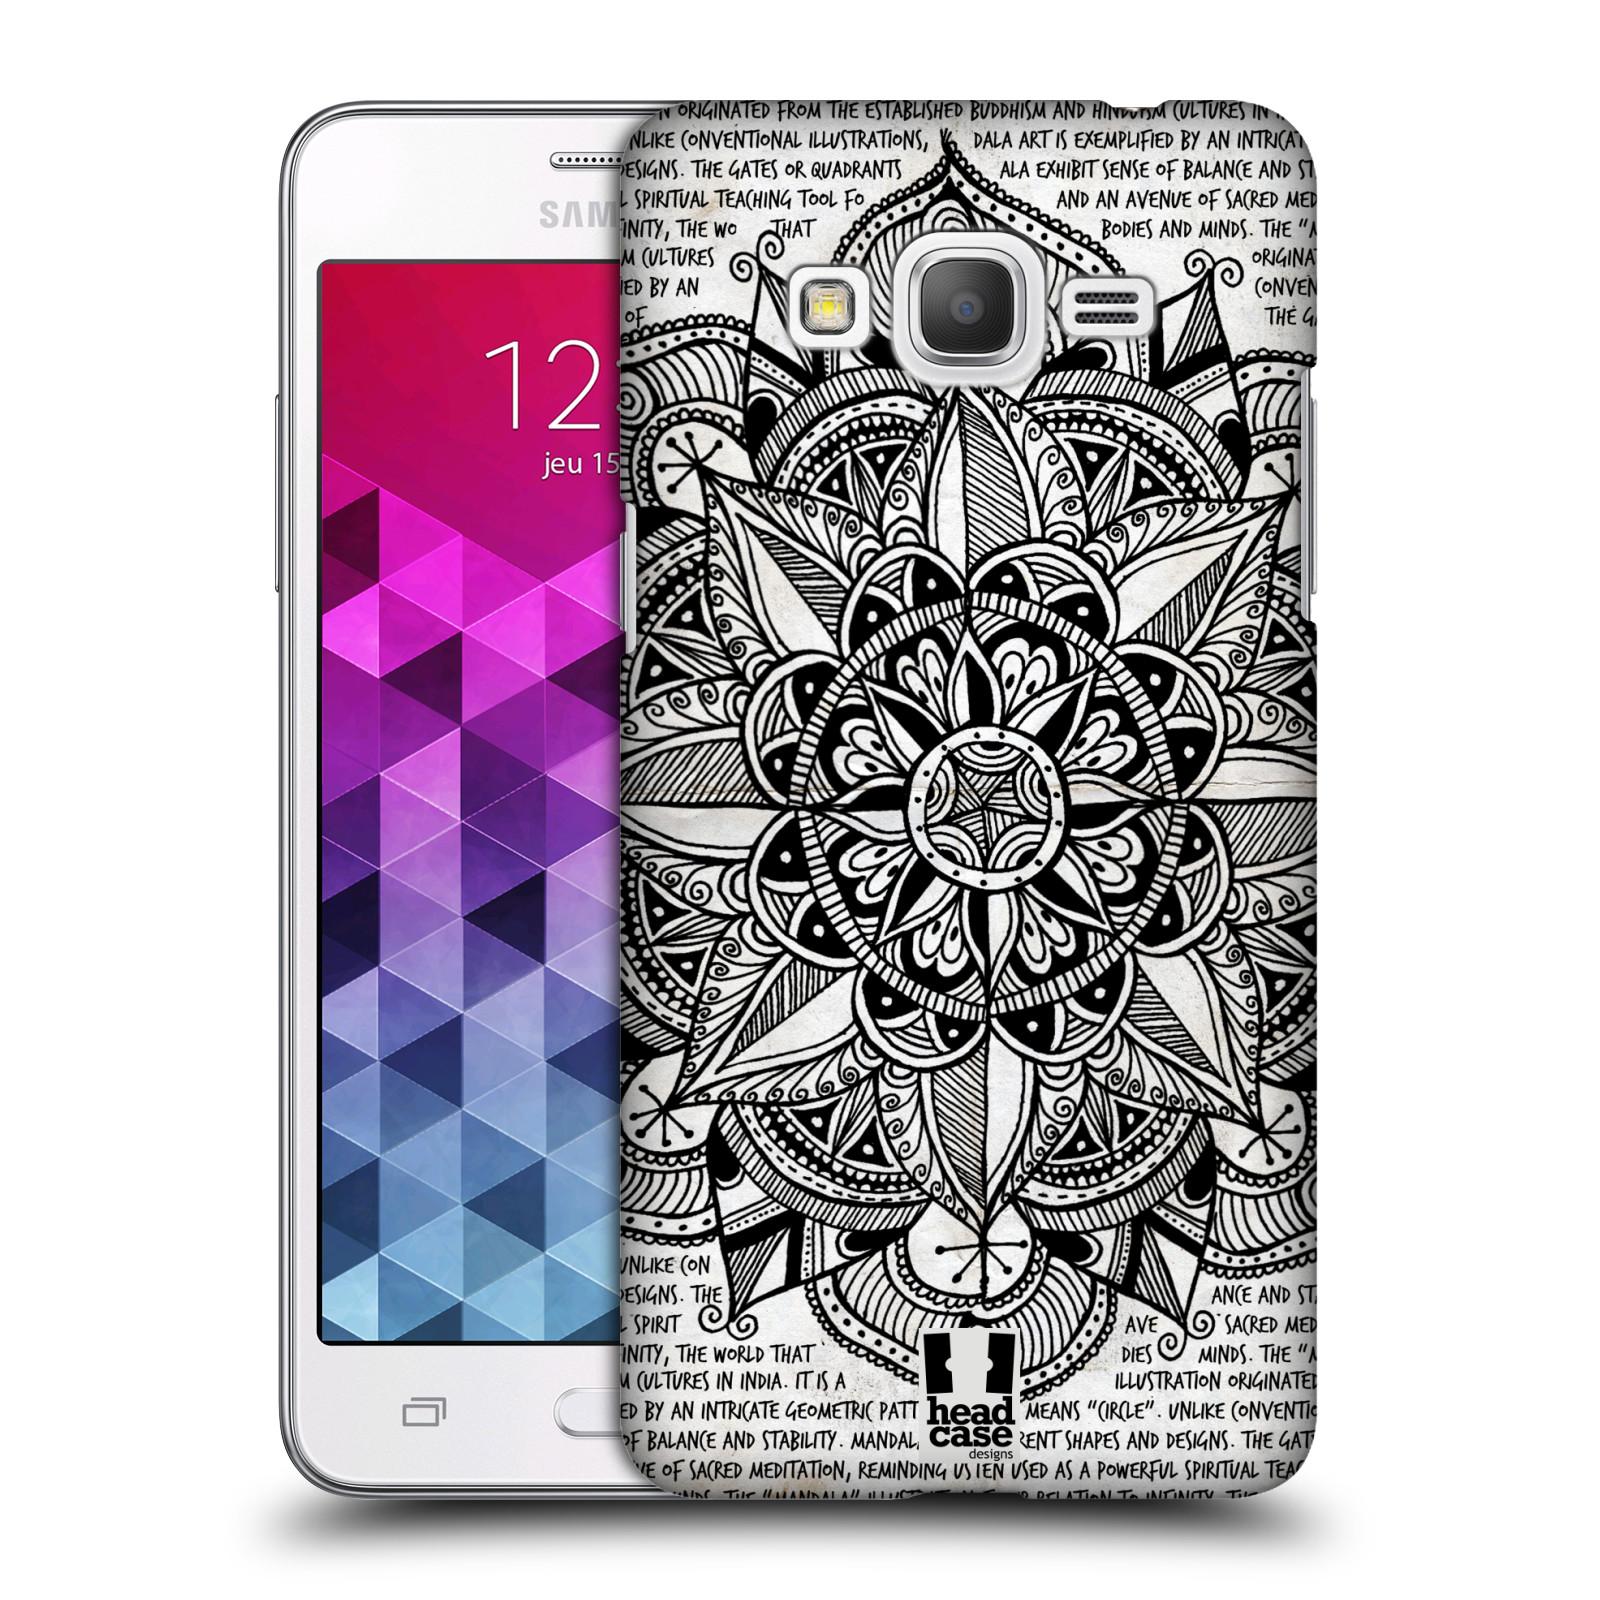 Funda head case designs con mandala doodles para samsung galaxy grand prime 3g duos - Grand mandala ...